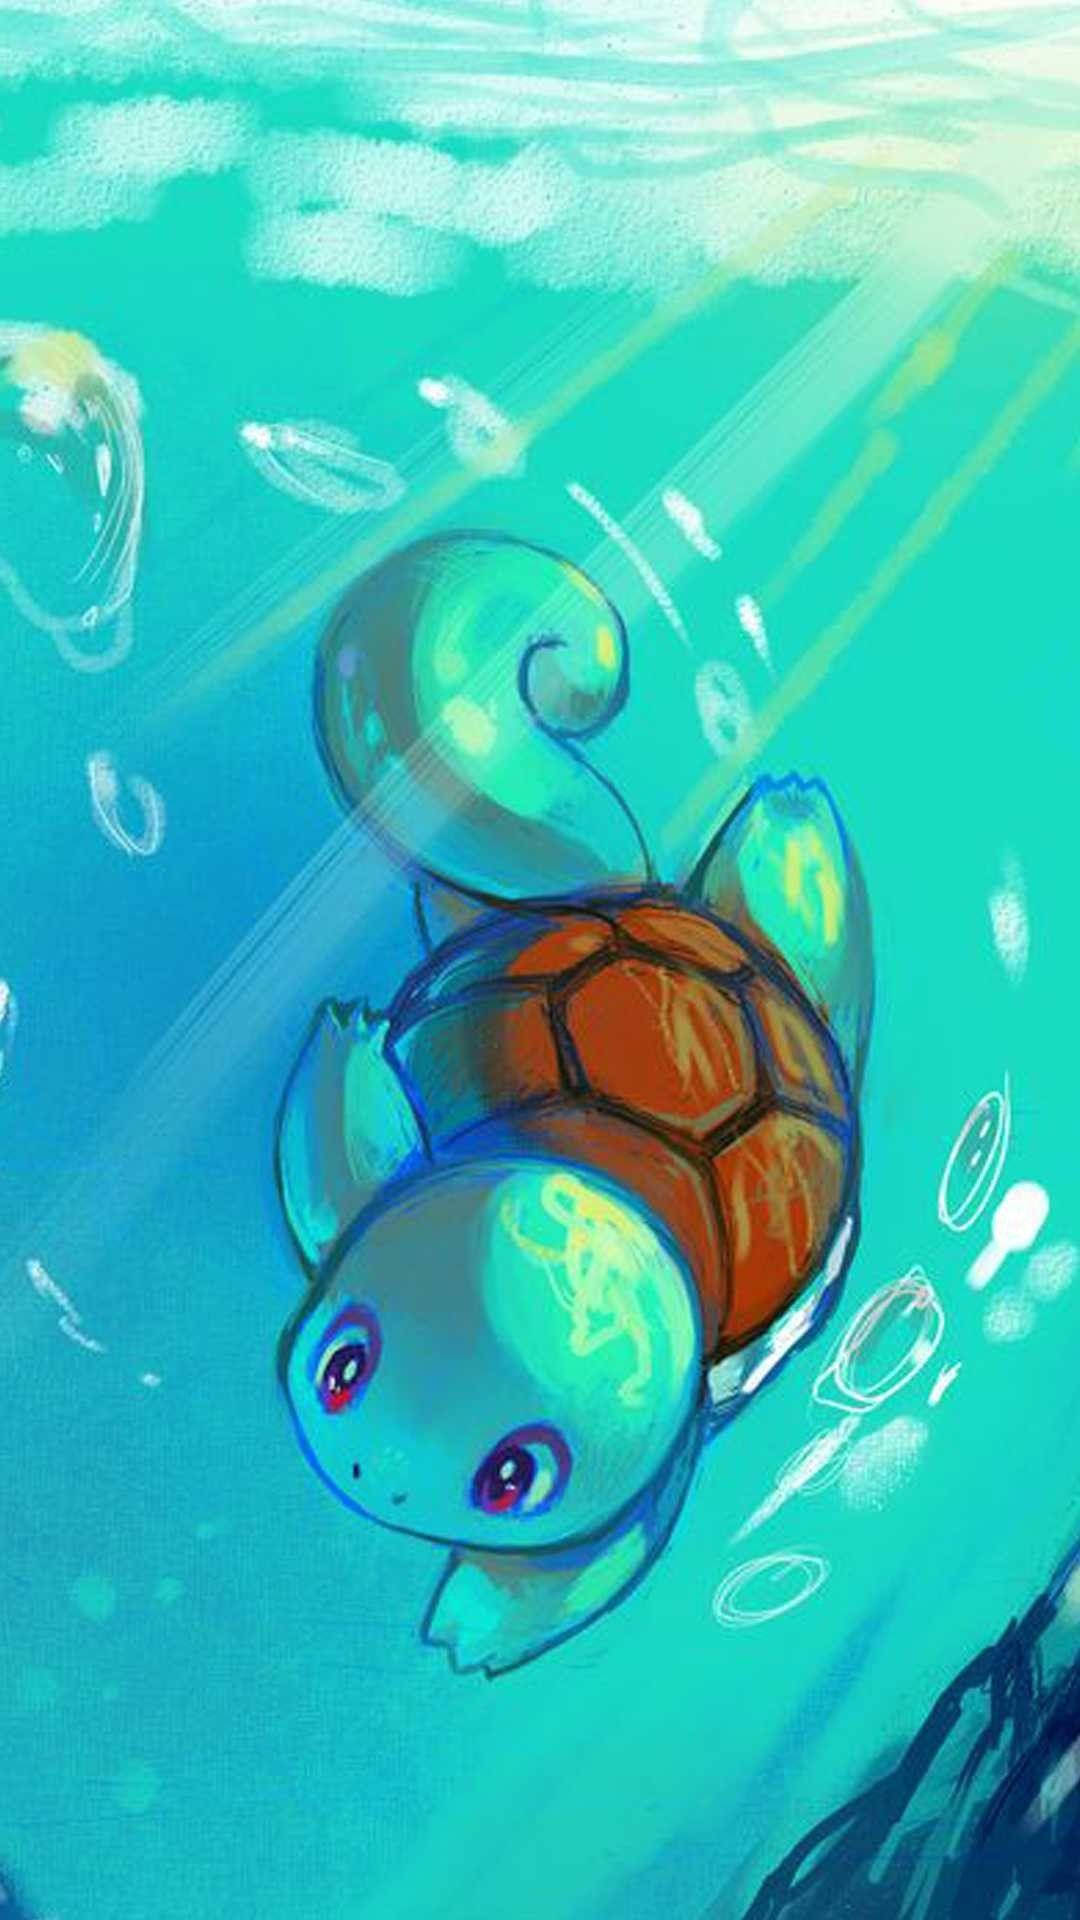 Pokemon Cool iPhone lock screen wallpaper